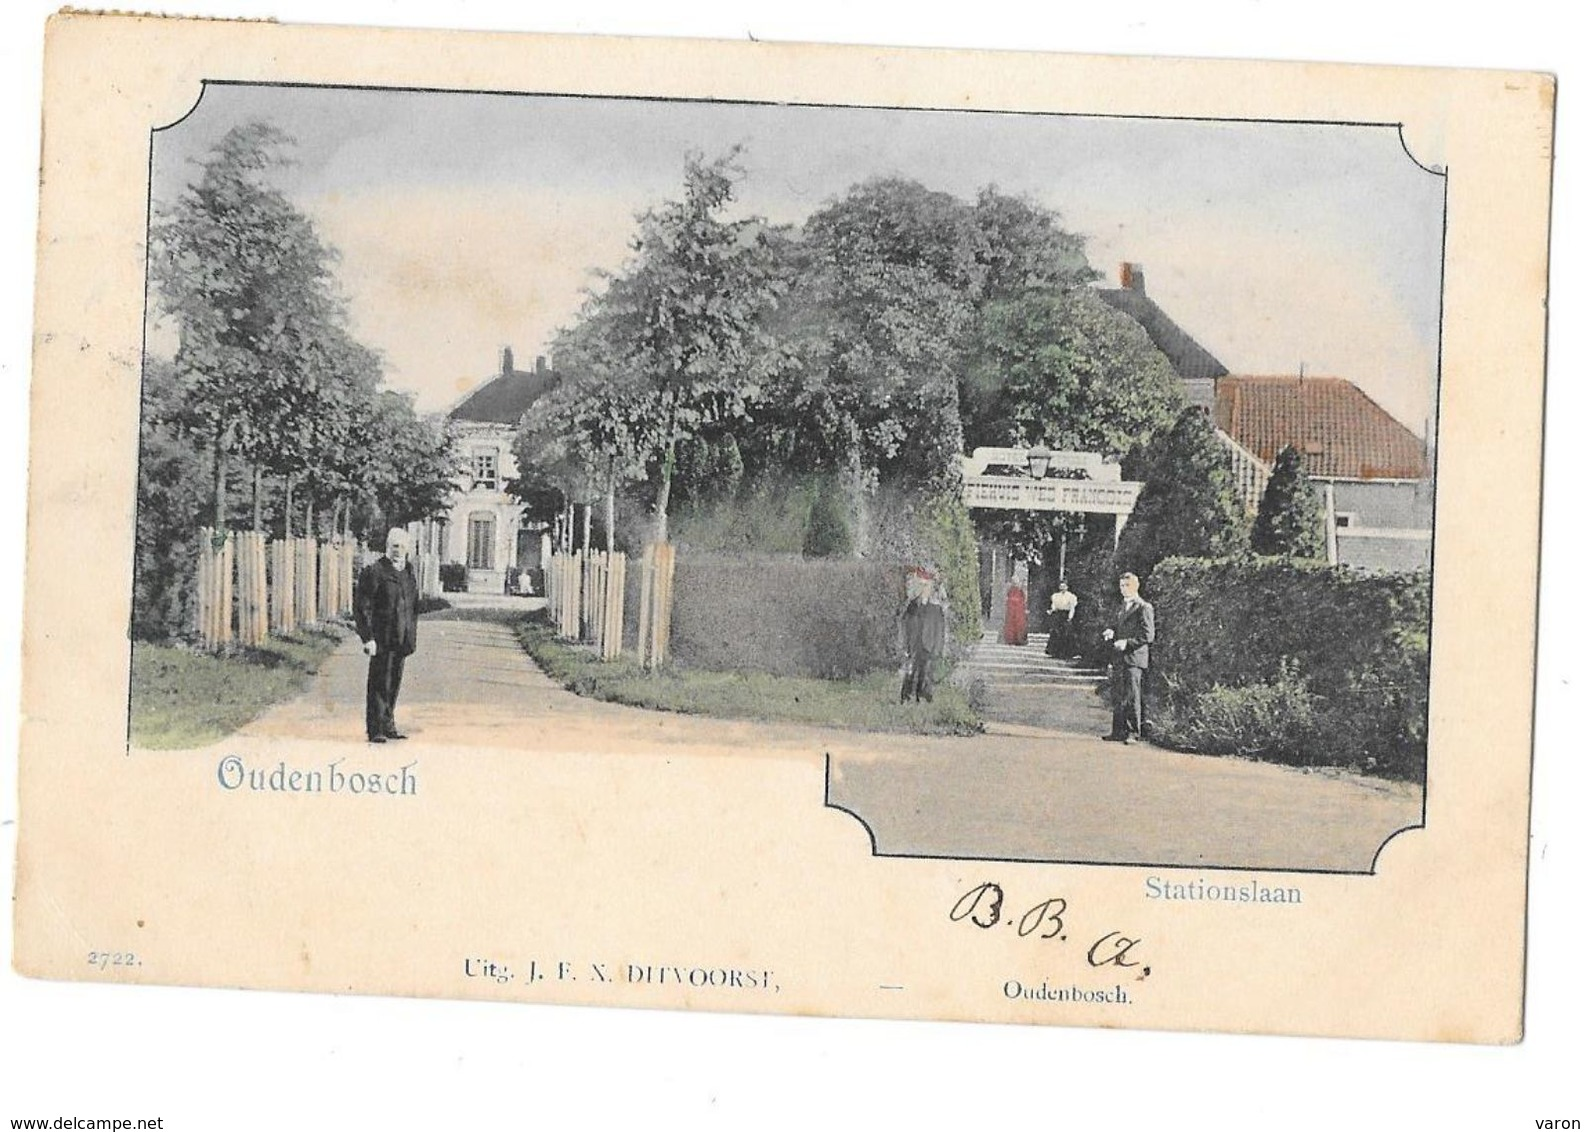 Pays-Bas -  OUDENBOSCH -    STATIONSLAAN - HOTEL TIVOLI   - Carte Pionnière 1903 - Editeur J.F.X.DITVOORST - Pays-Bas